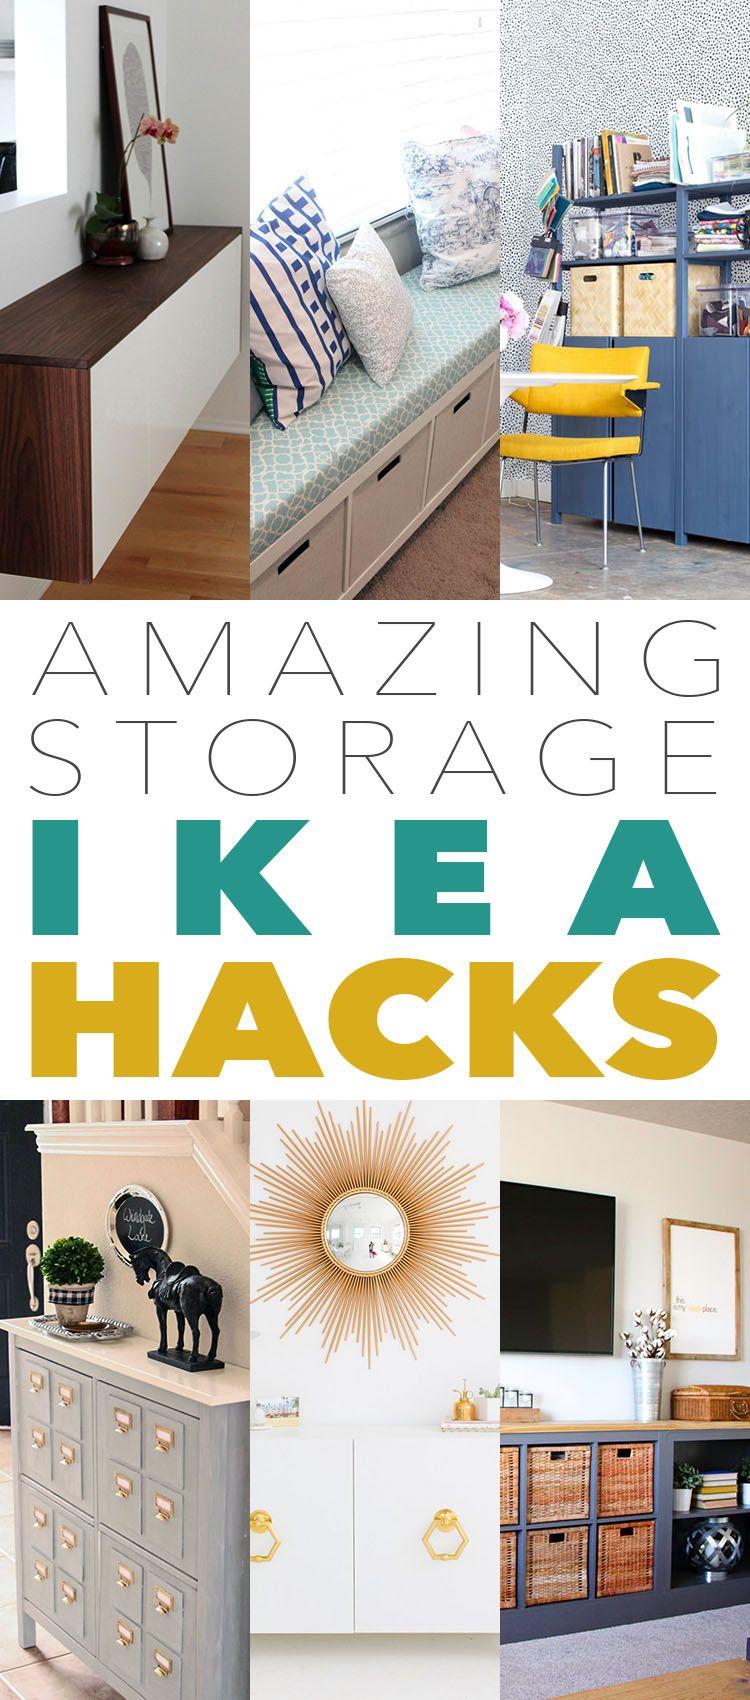 Ikea Möbel Pimpen amazing storage ikea hacks ikea möbel pimpen ikea möbel und ikea